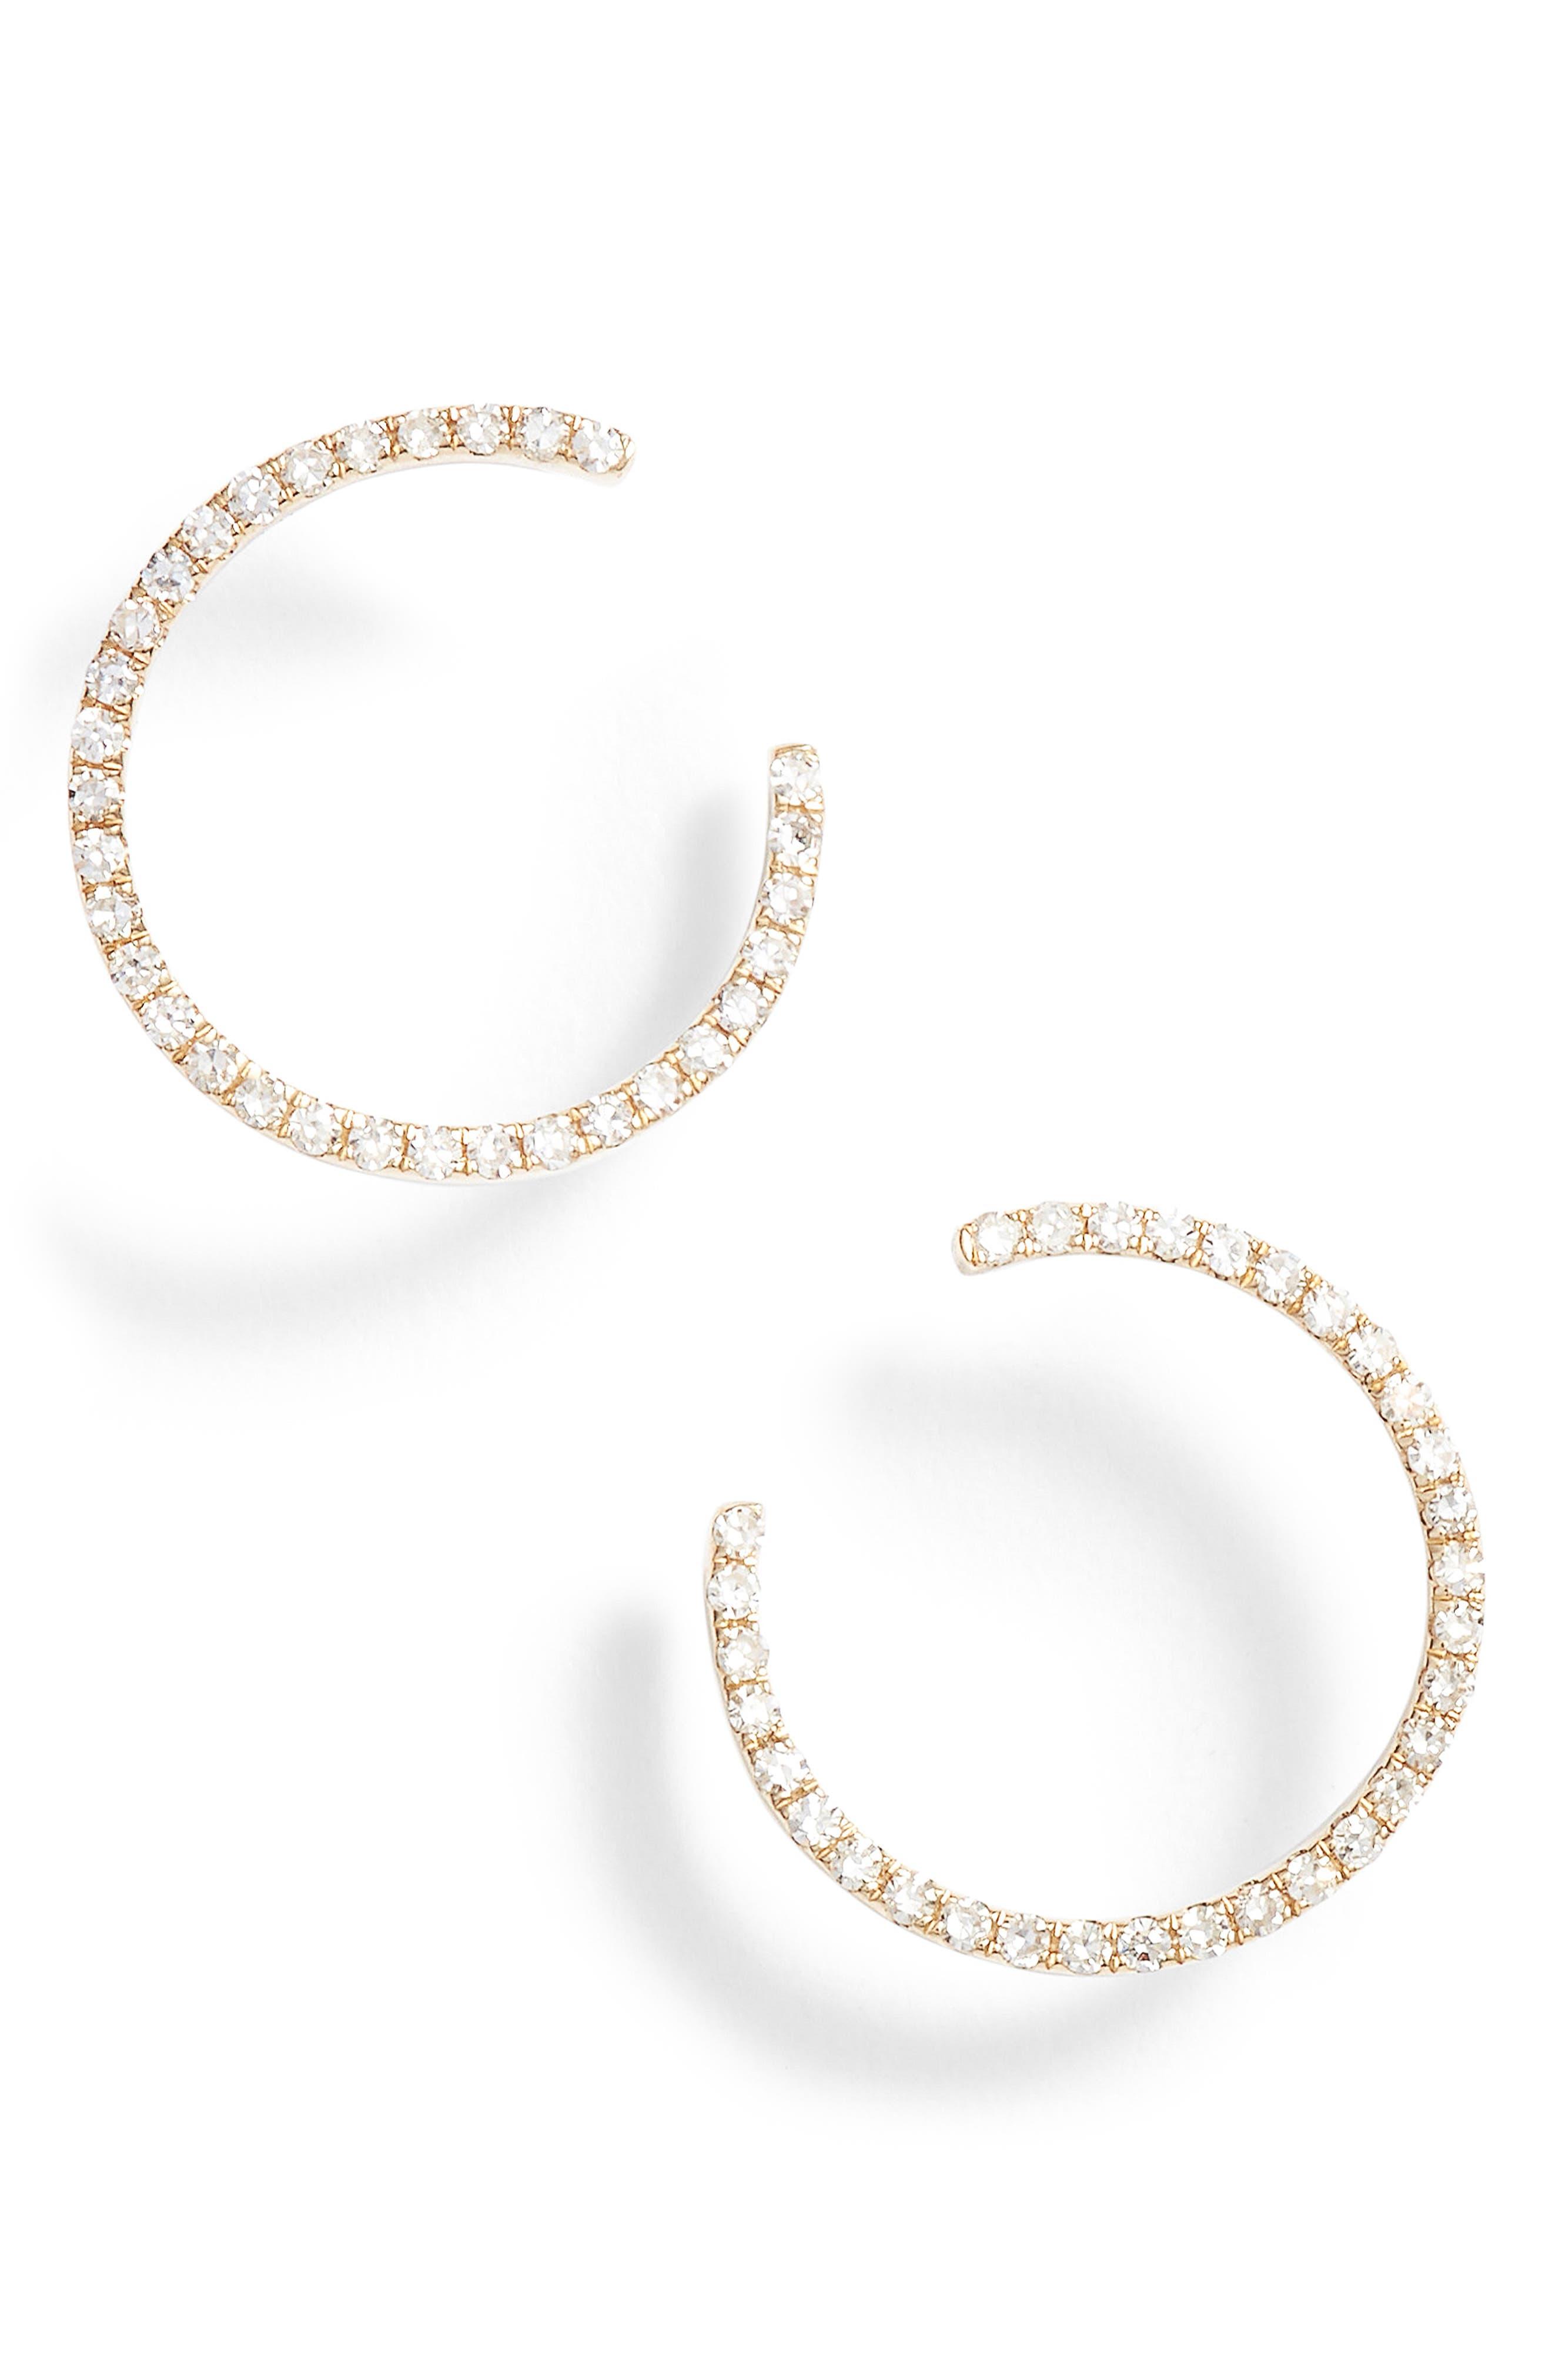 Diamond Illusion Hoop Earrings,                             Main thumbnail 1, color,                             Yellow Gold